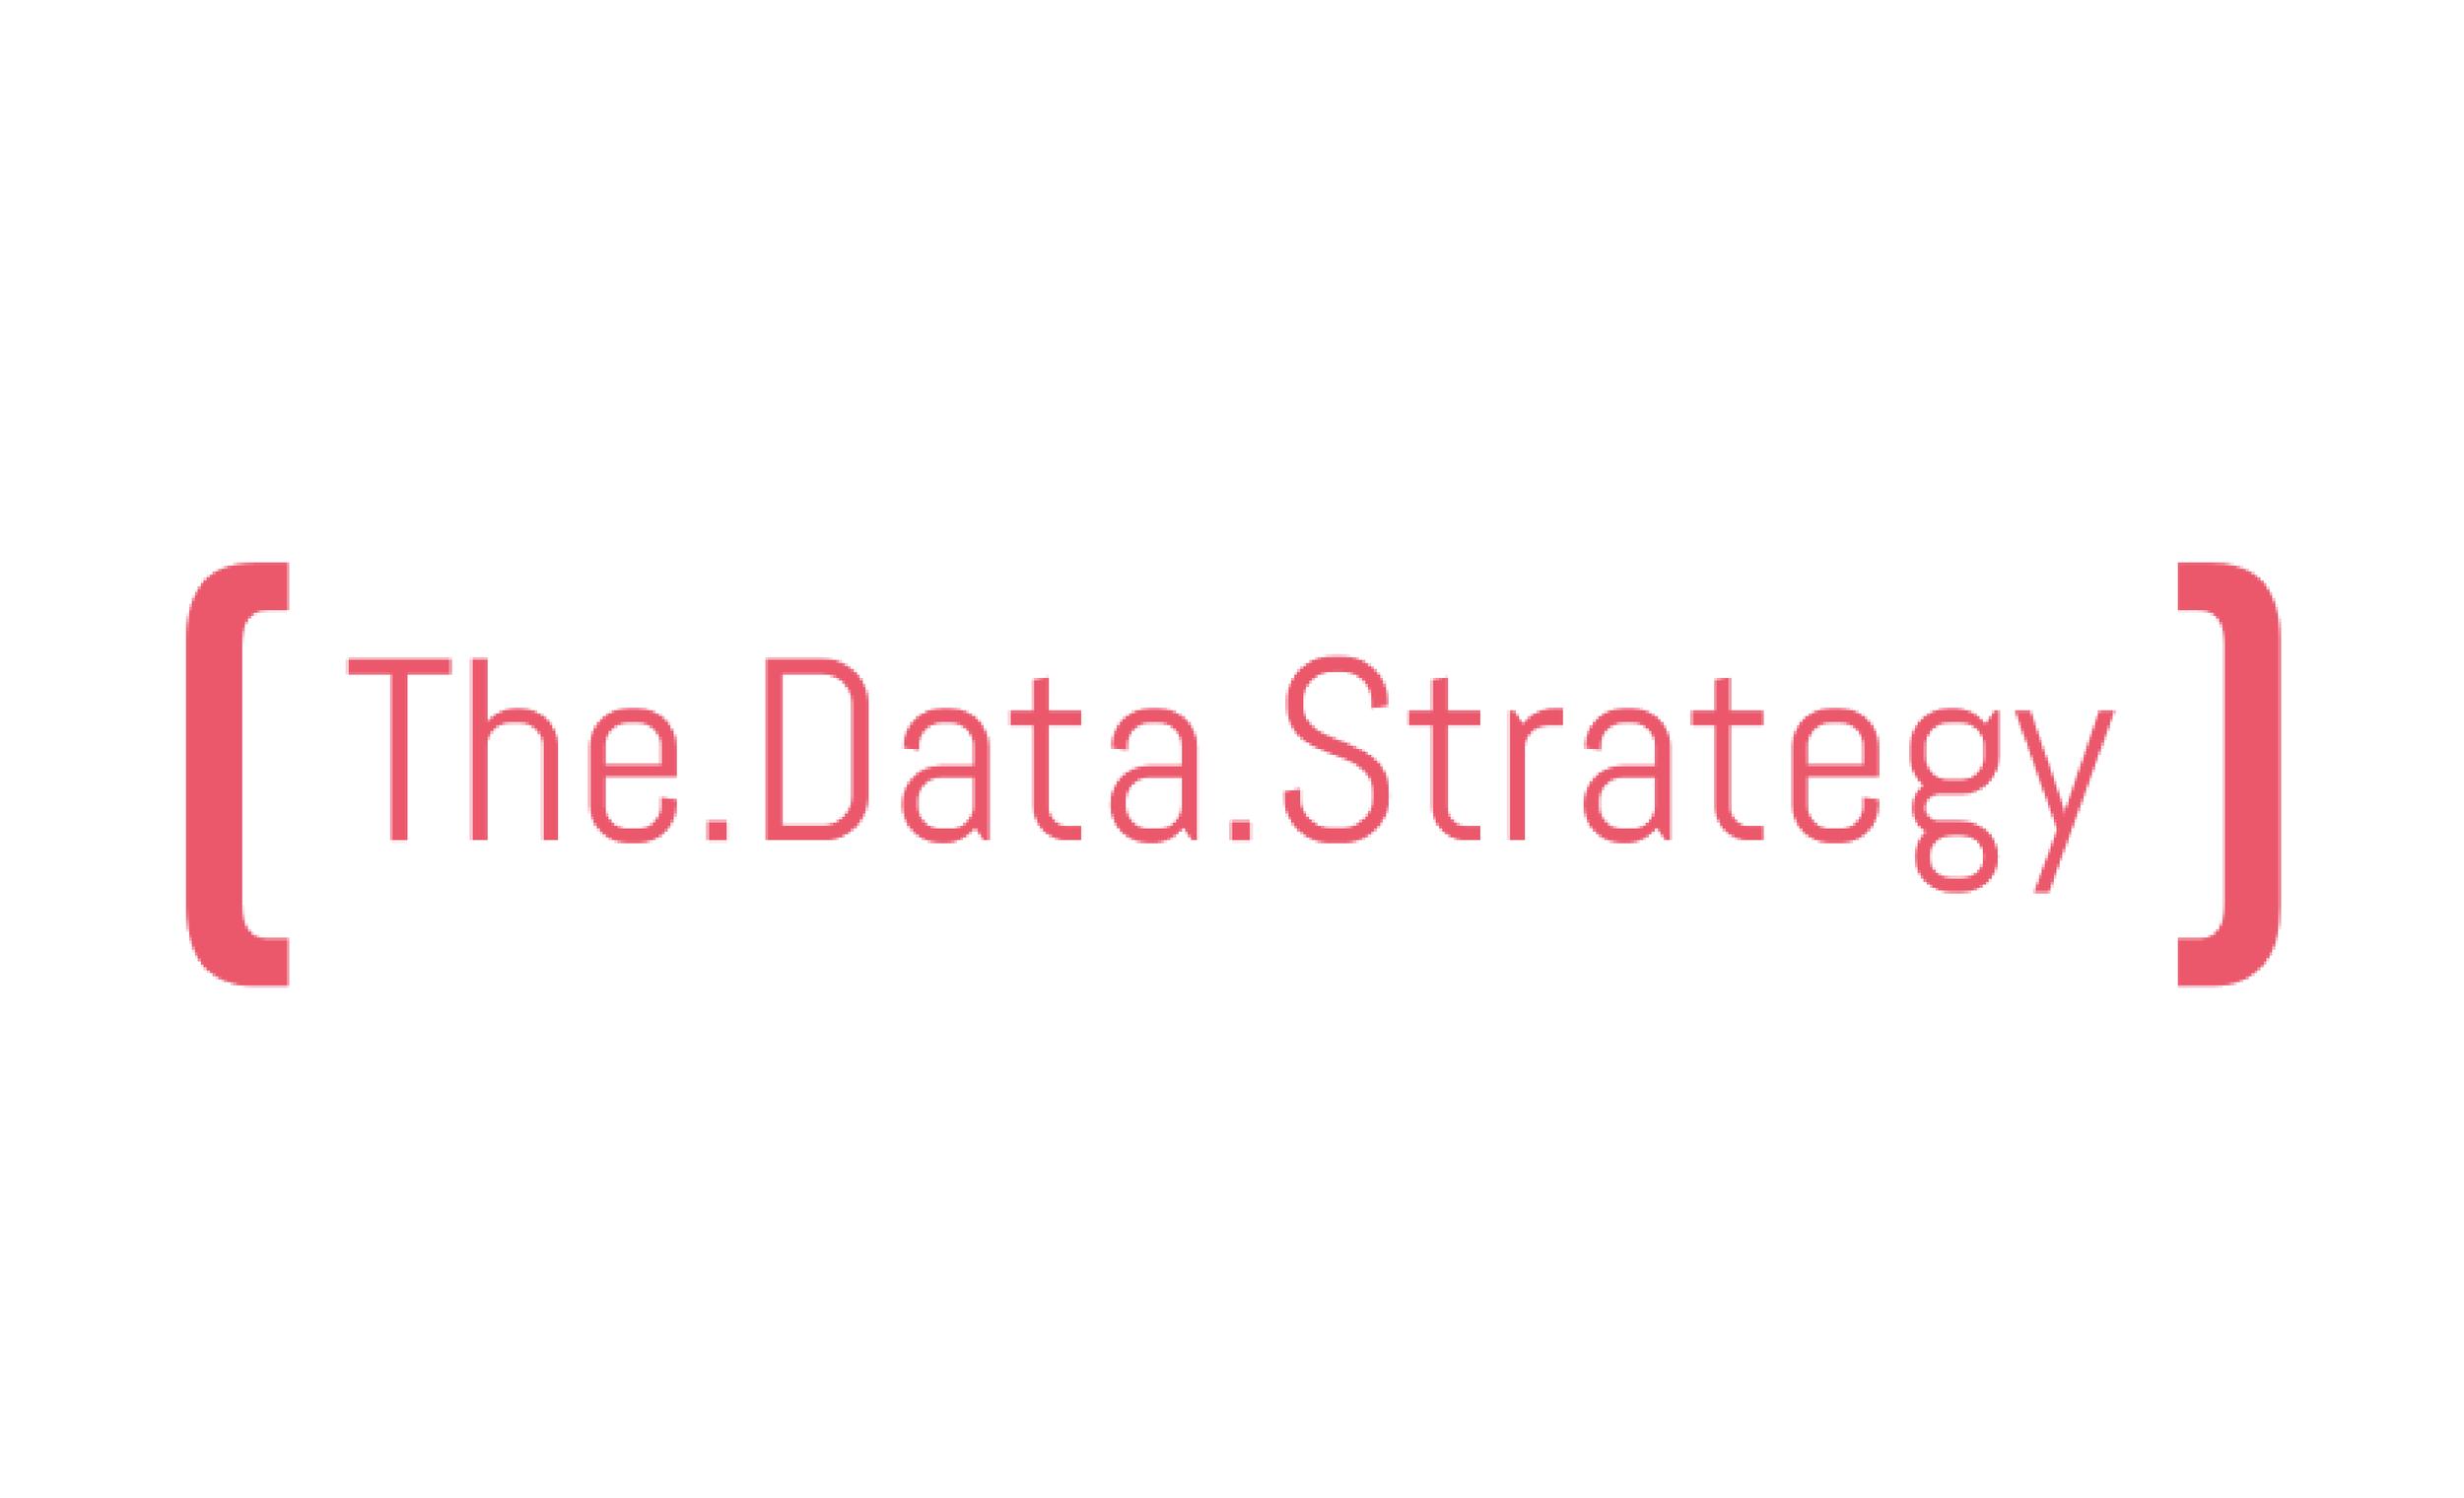 LTT envolve data-05.png